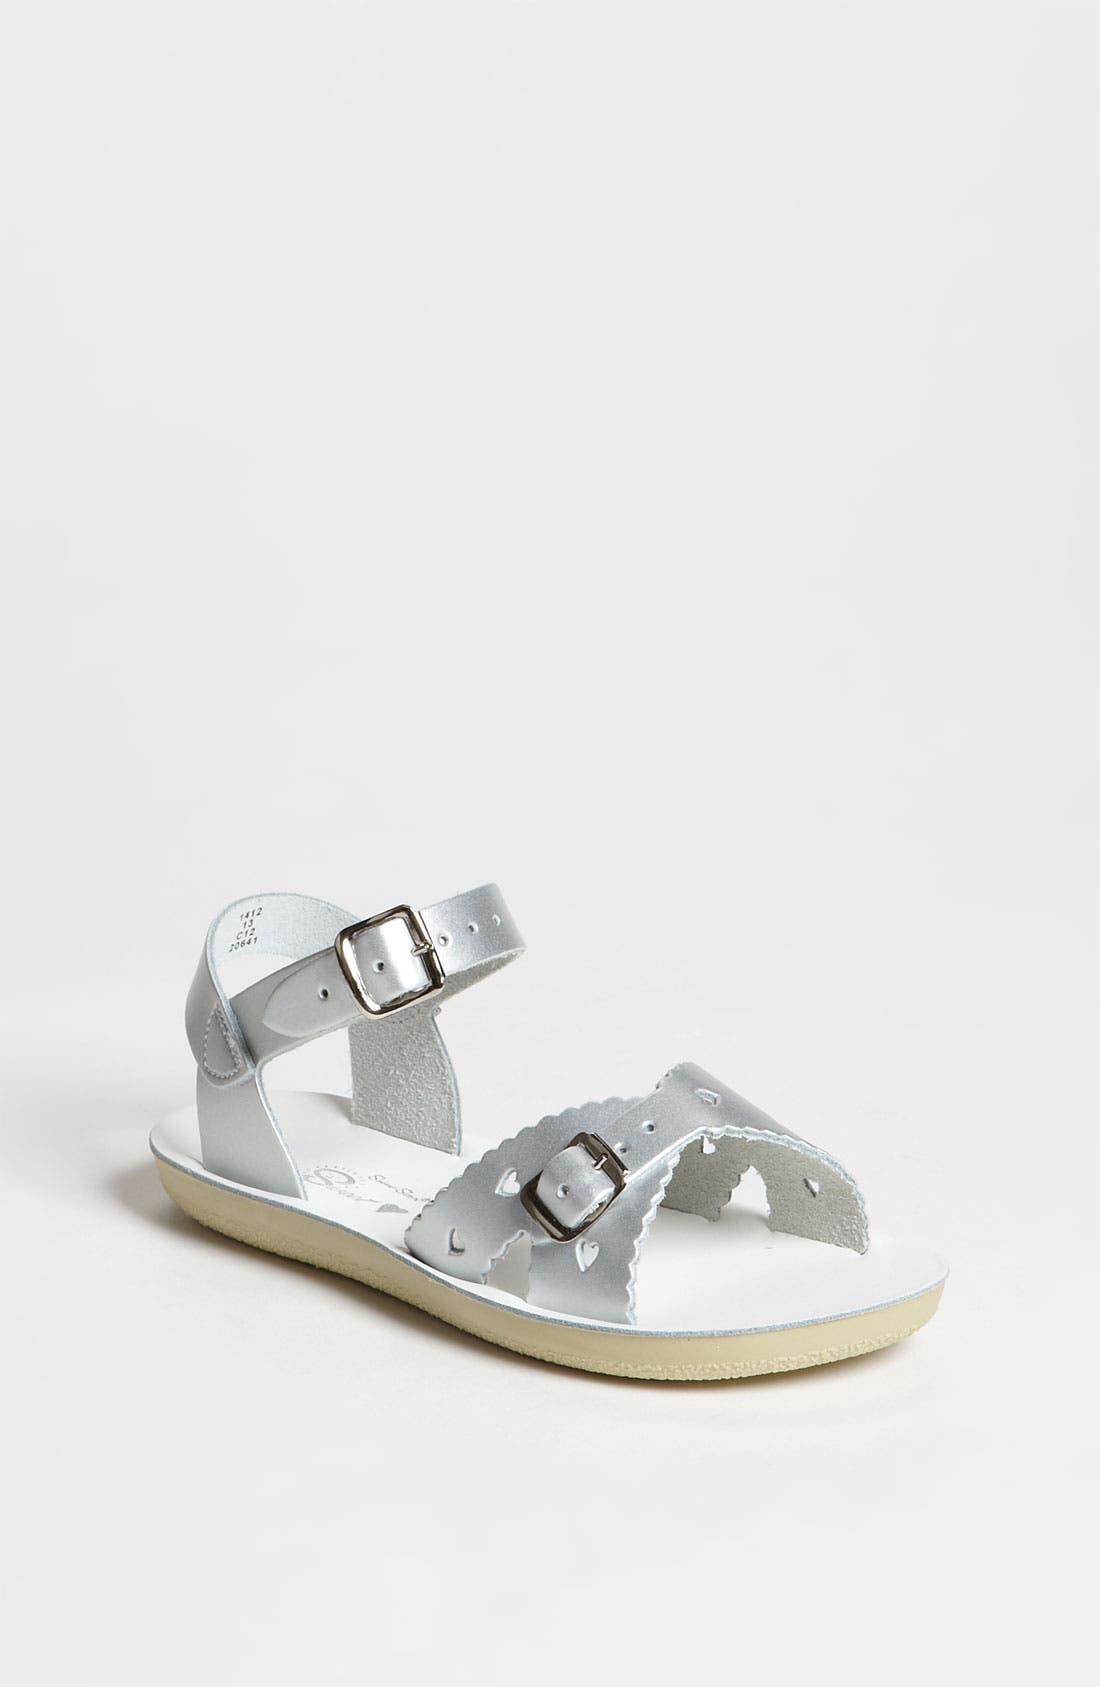 Baby Salt Water Sandals by Hoy, Walker